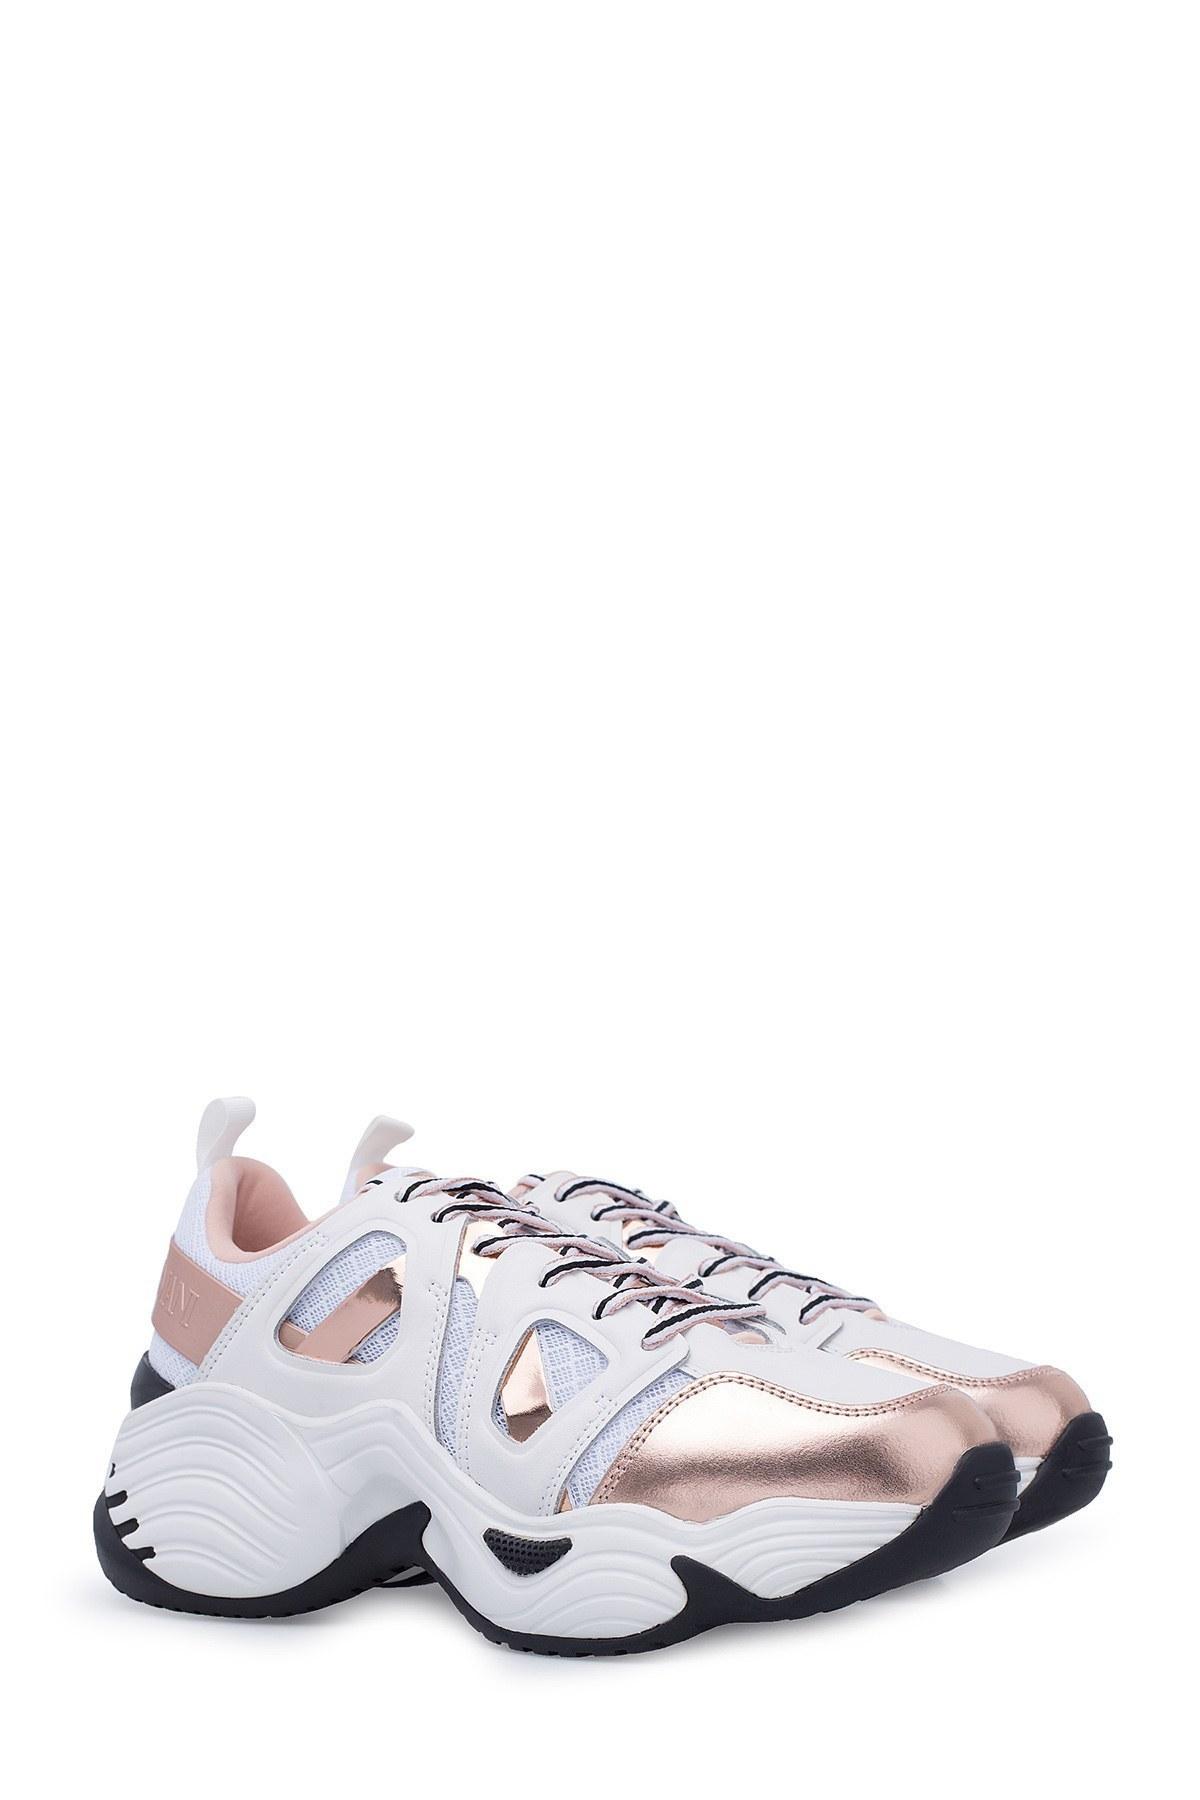 Emporio Armani Kadın Ayakkabı X3X099 XM250 R700 BEYAZ-GOLD